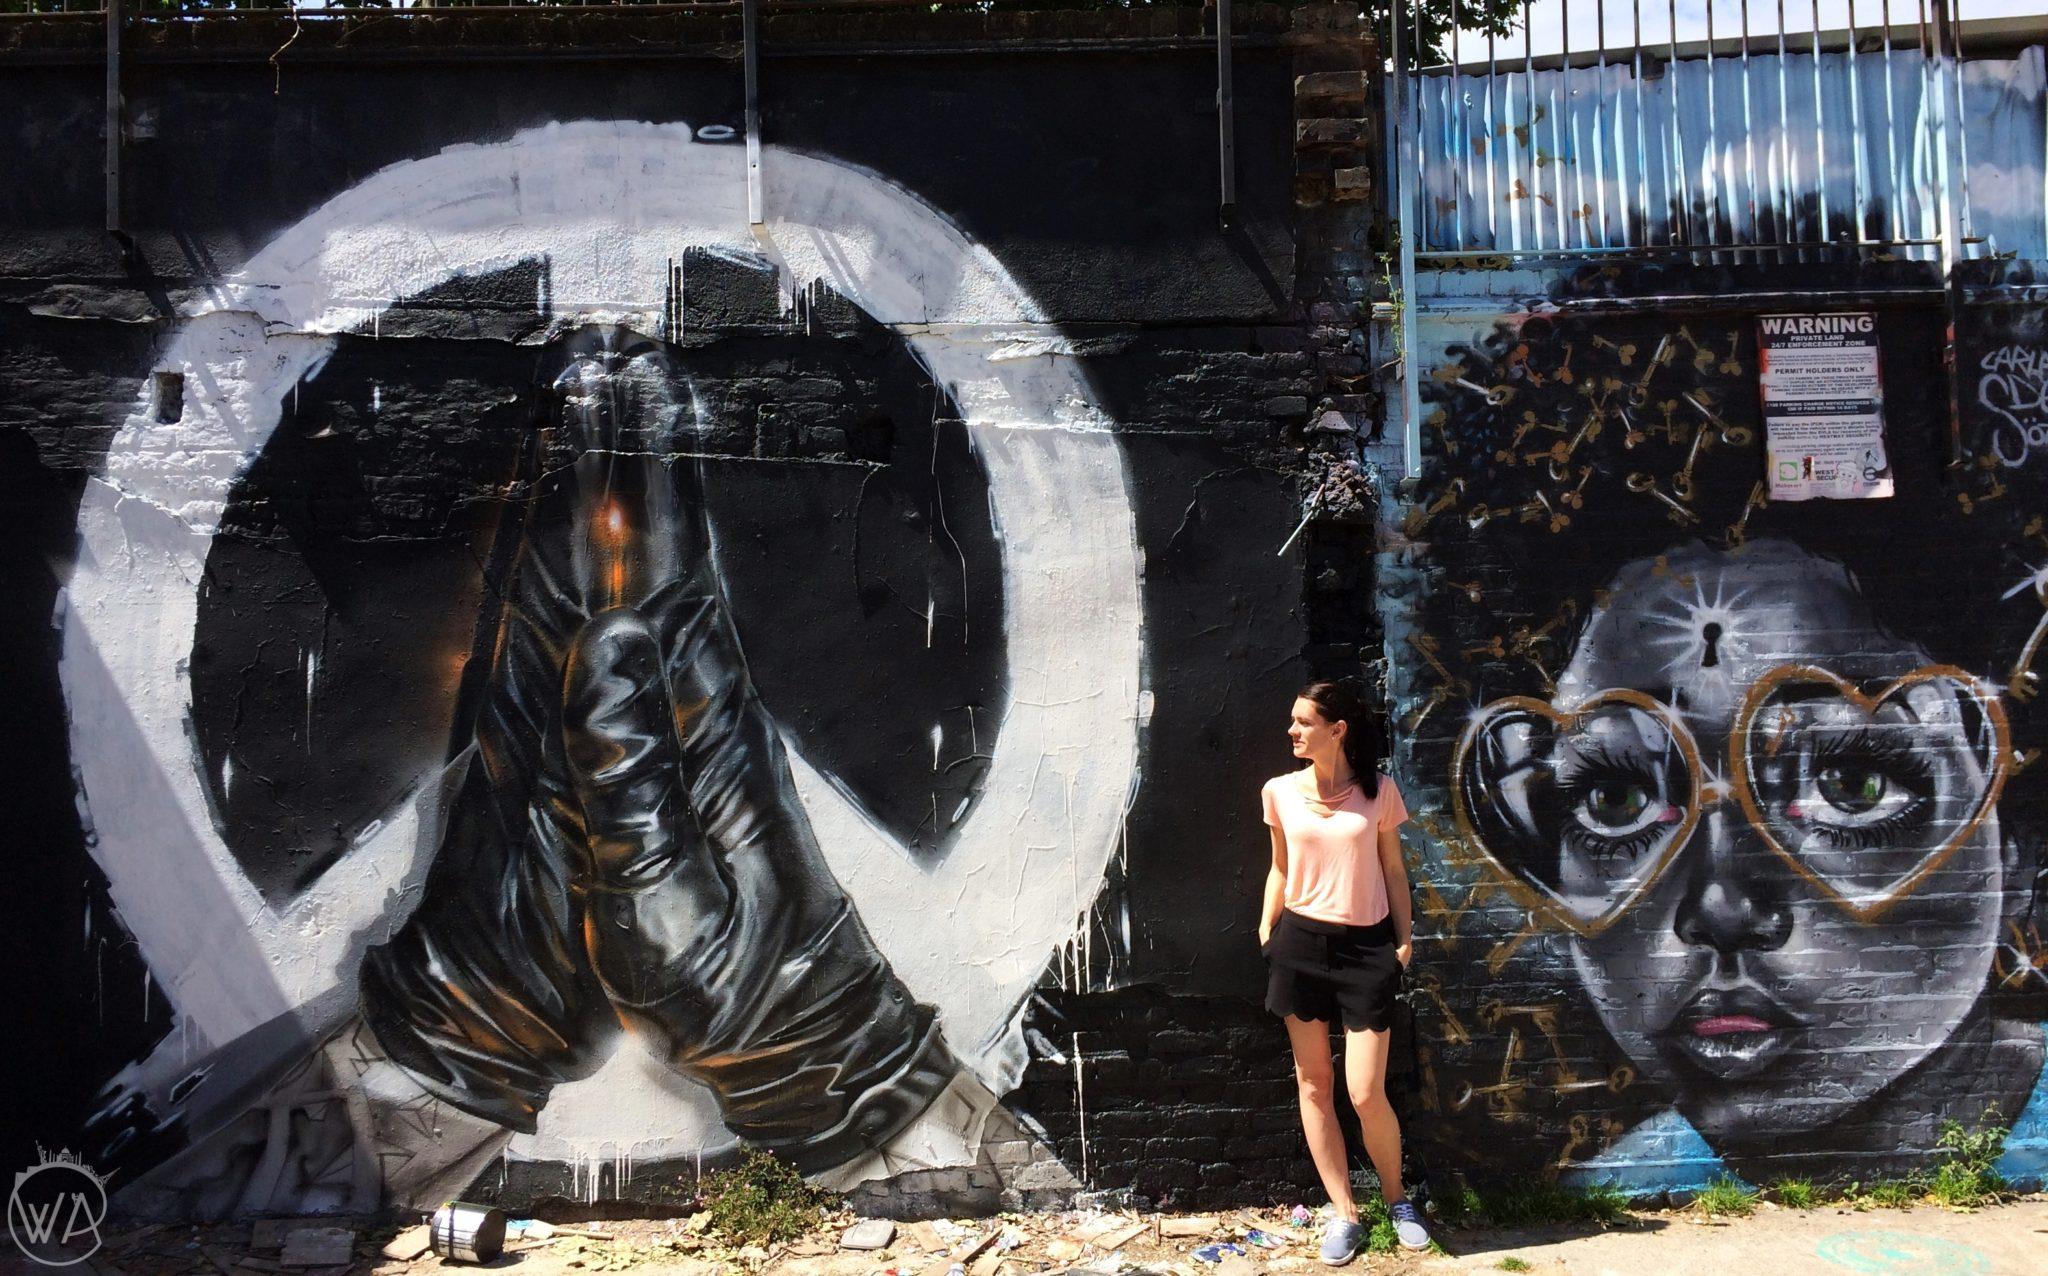 street art mural London